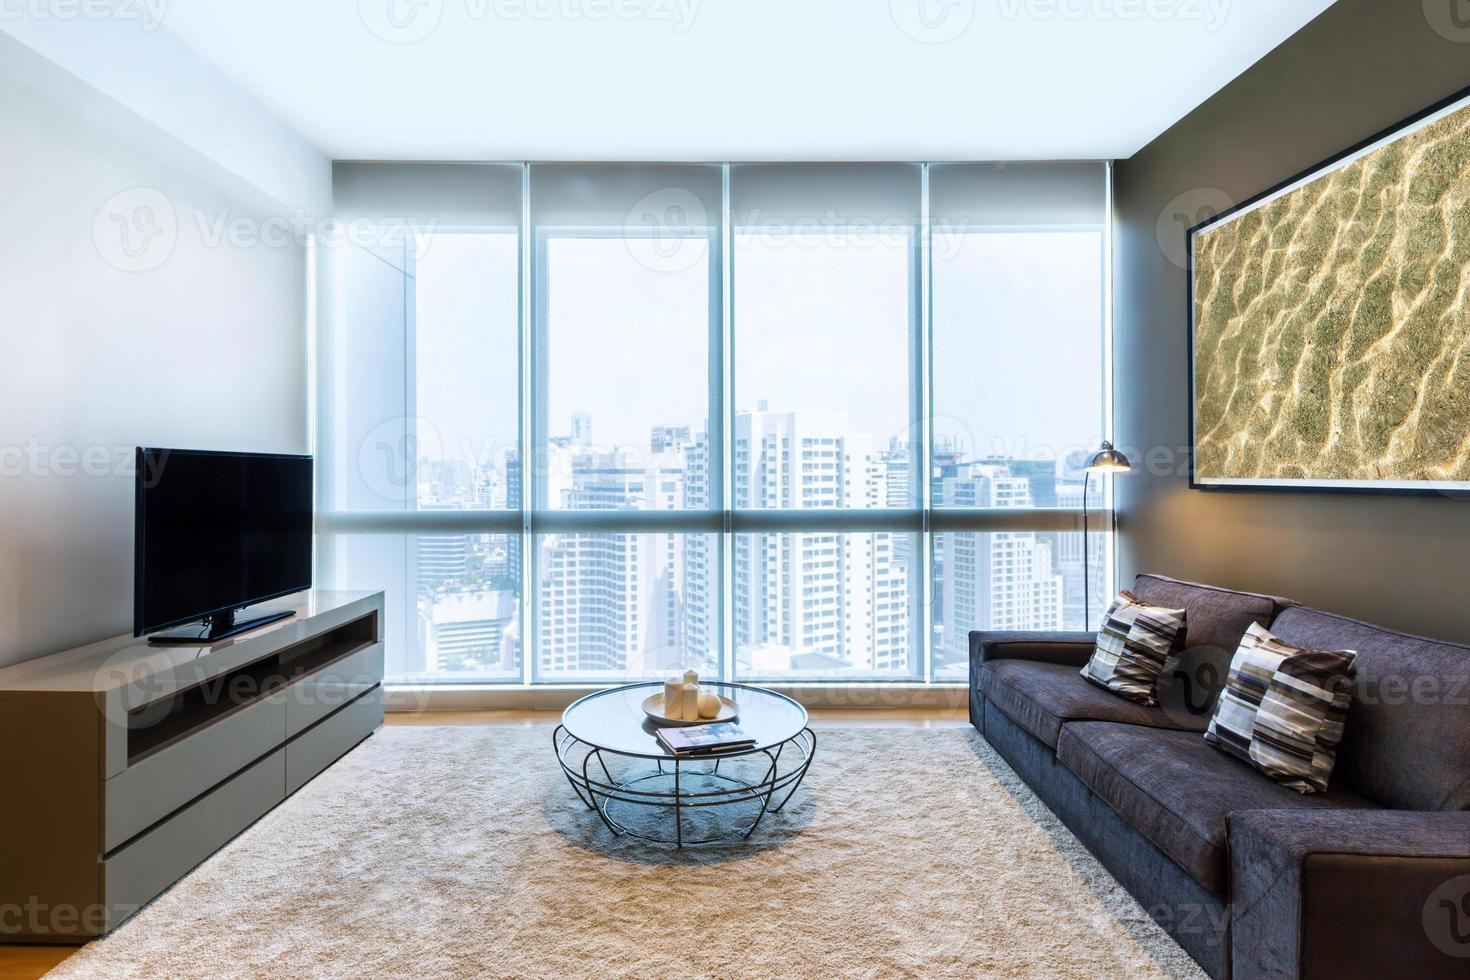 sala de estar com janela grande foto